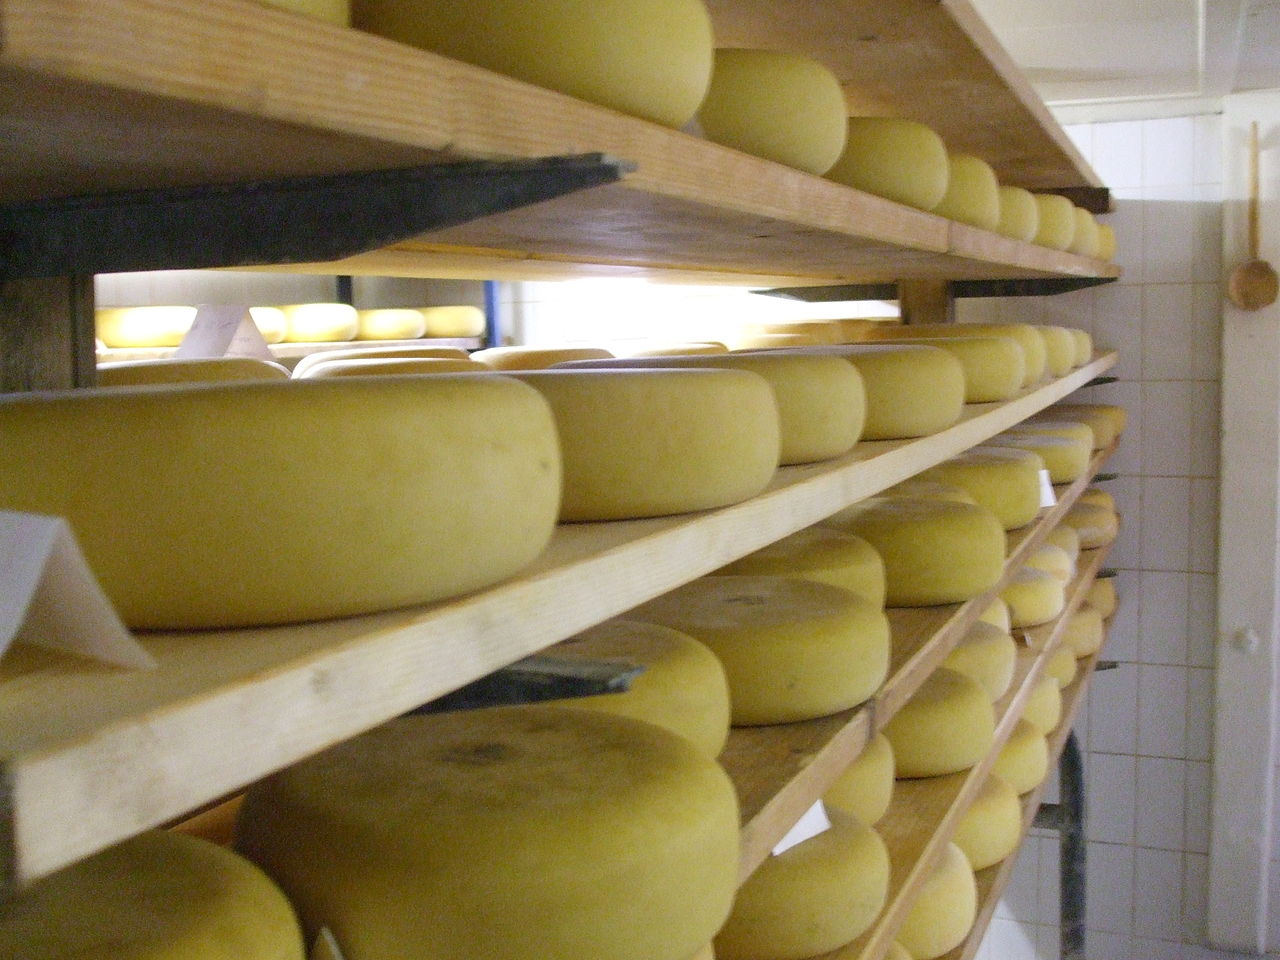 Making Gouda Cheese At Home